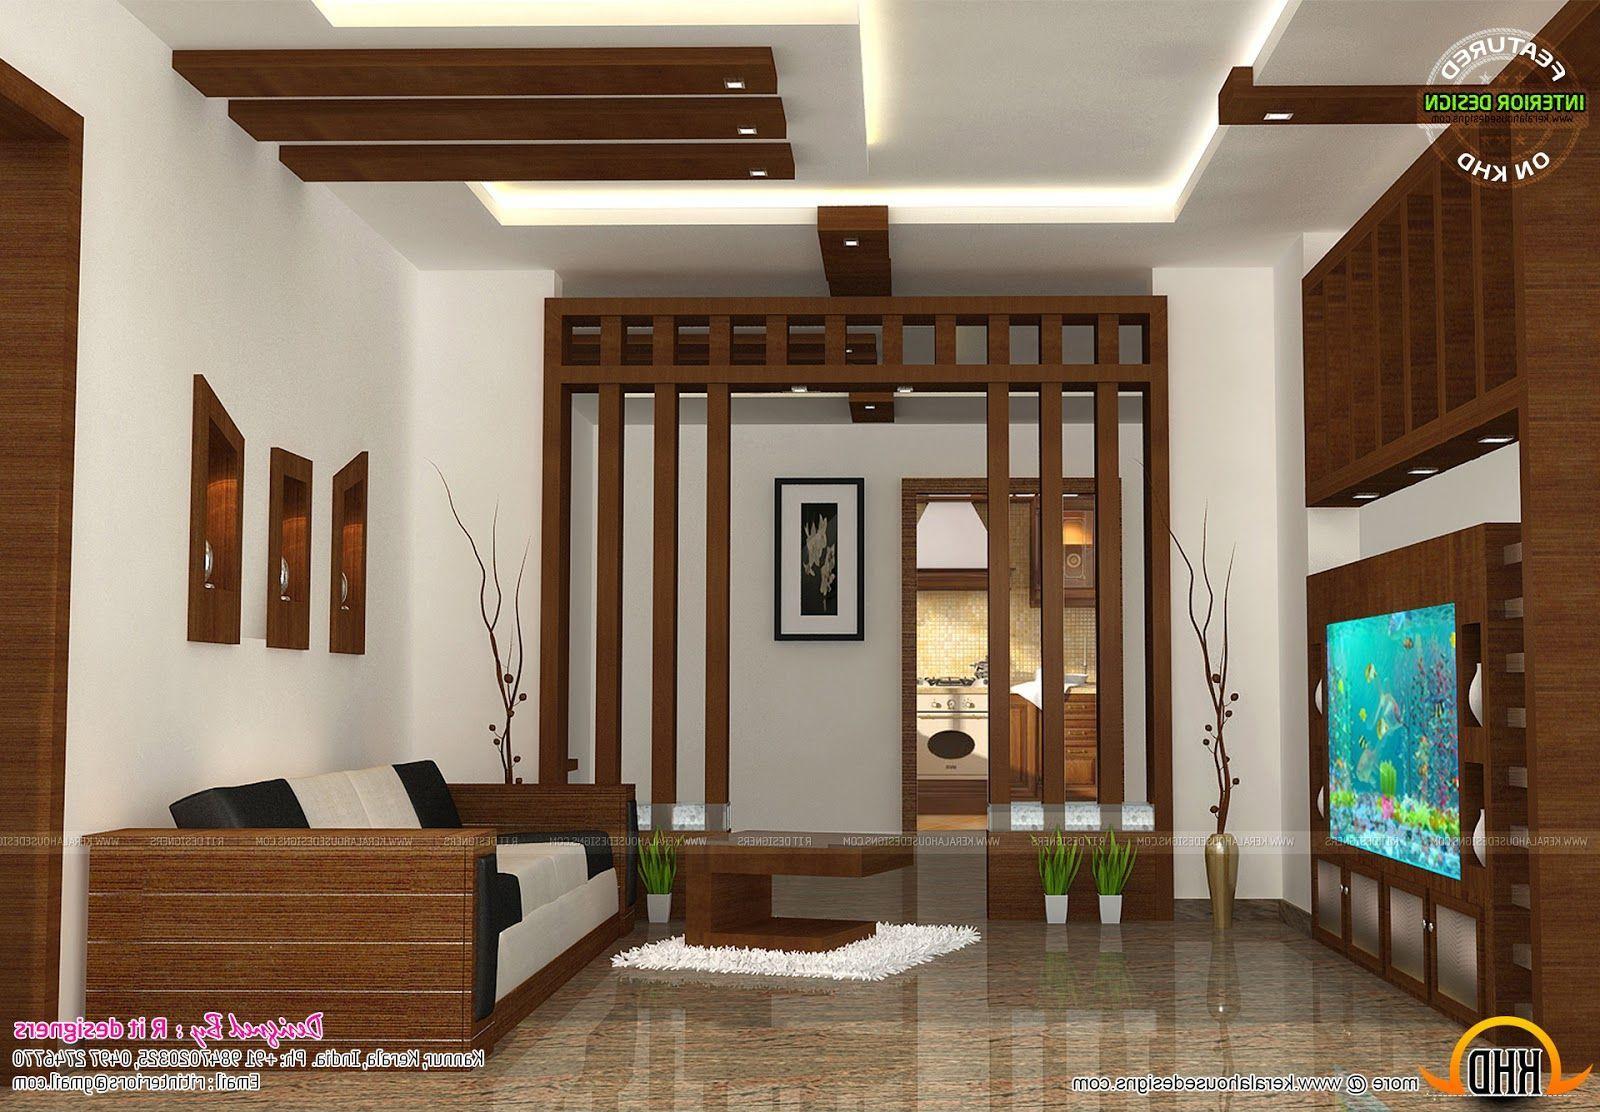 interior design living room kerala | APARTMENT LIVING ROOM IDEAS in 2019 | Living room kerala ...